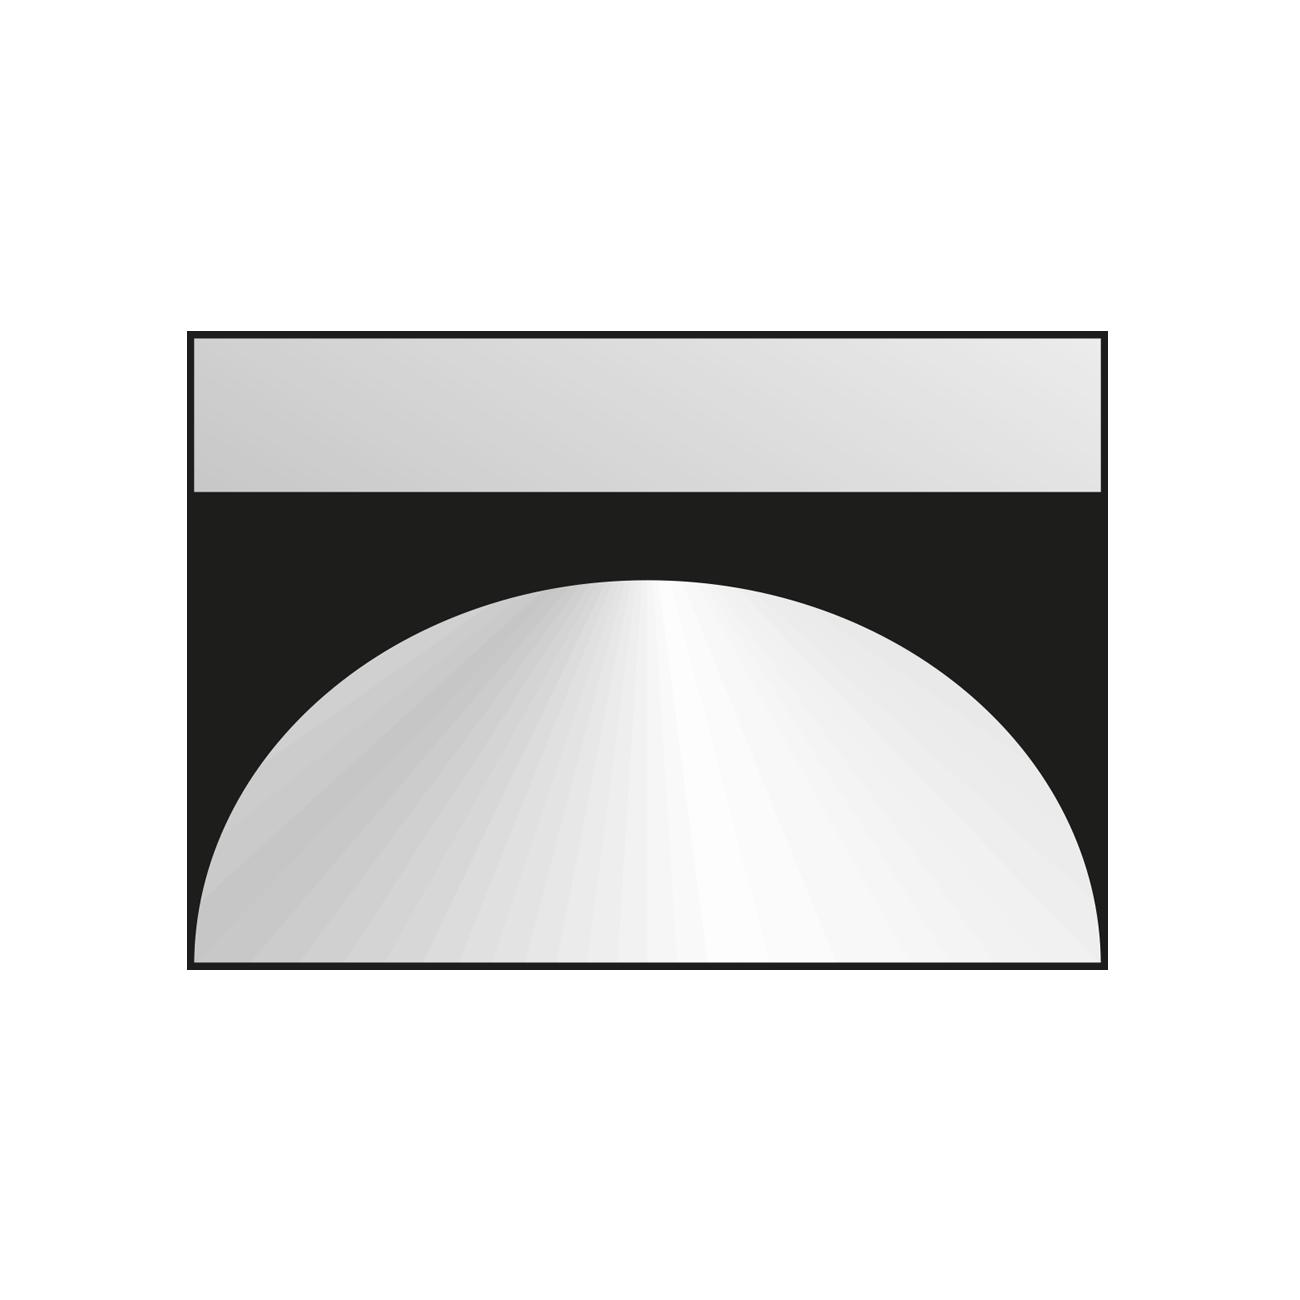 Pana Circulara 6888 Otel Olc45-4x 6.5-16